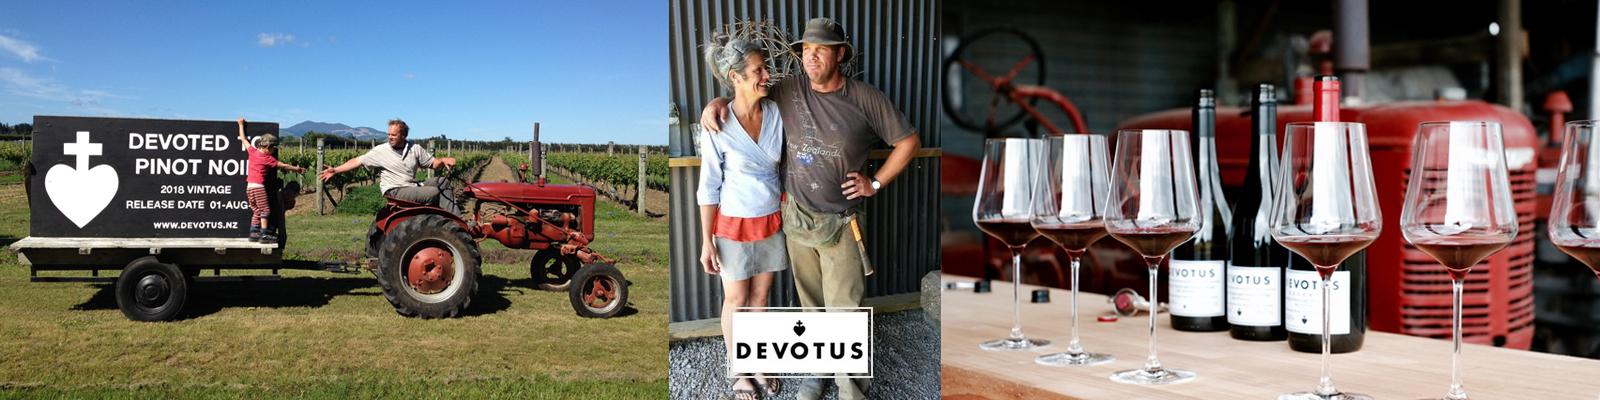 banner-devotus-wines.jpg